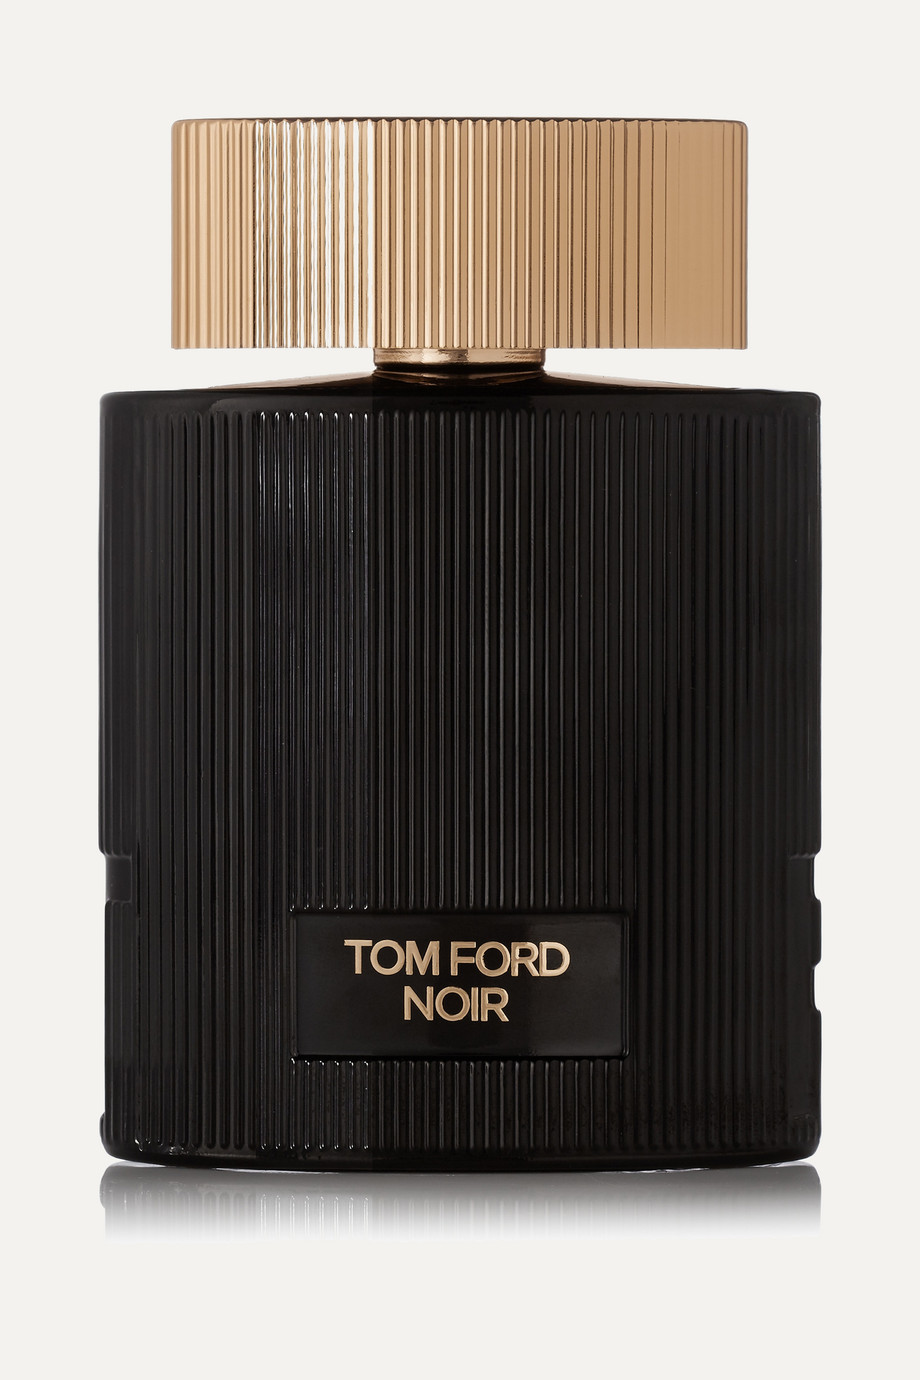 TOM FORD BEAUTY Noir Pour Femme Eau de Parfum - Bitter Orange Oil, Ginger Extract & Rose Absolute, 50ml